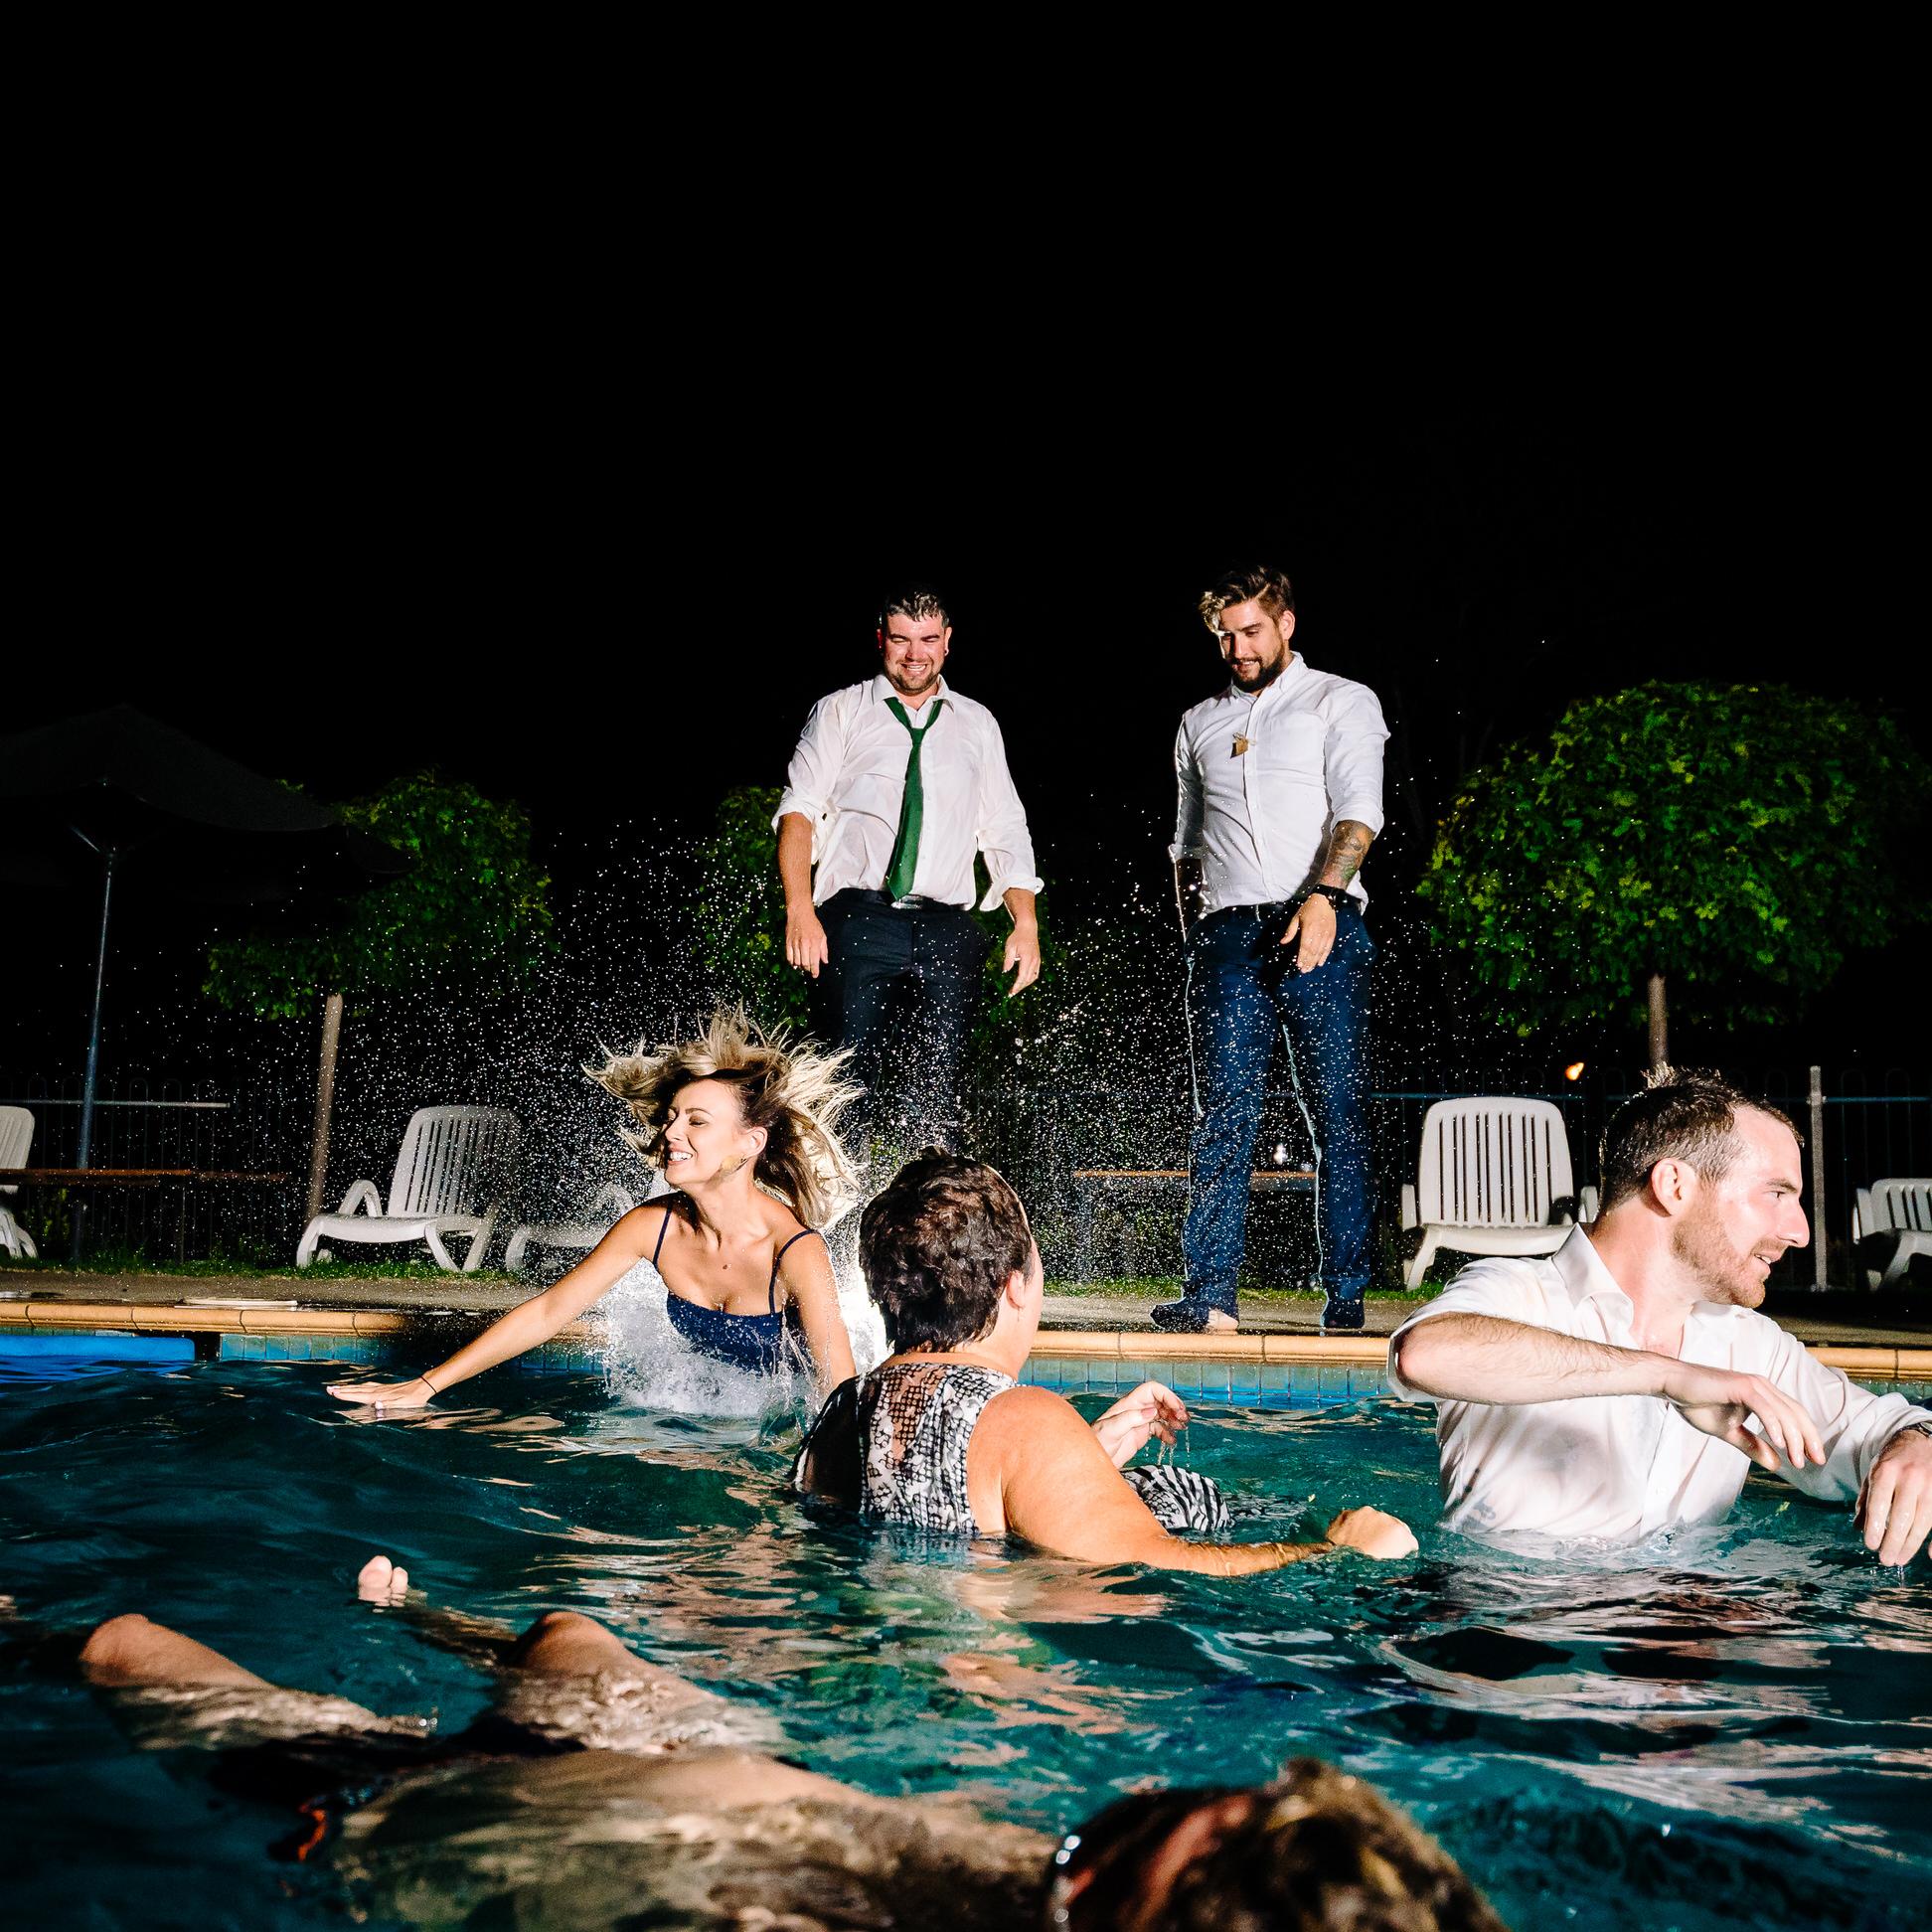 Justin_Jim_Echuca_Wedding_Photography_Tindarra-377.JPG